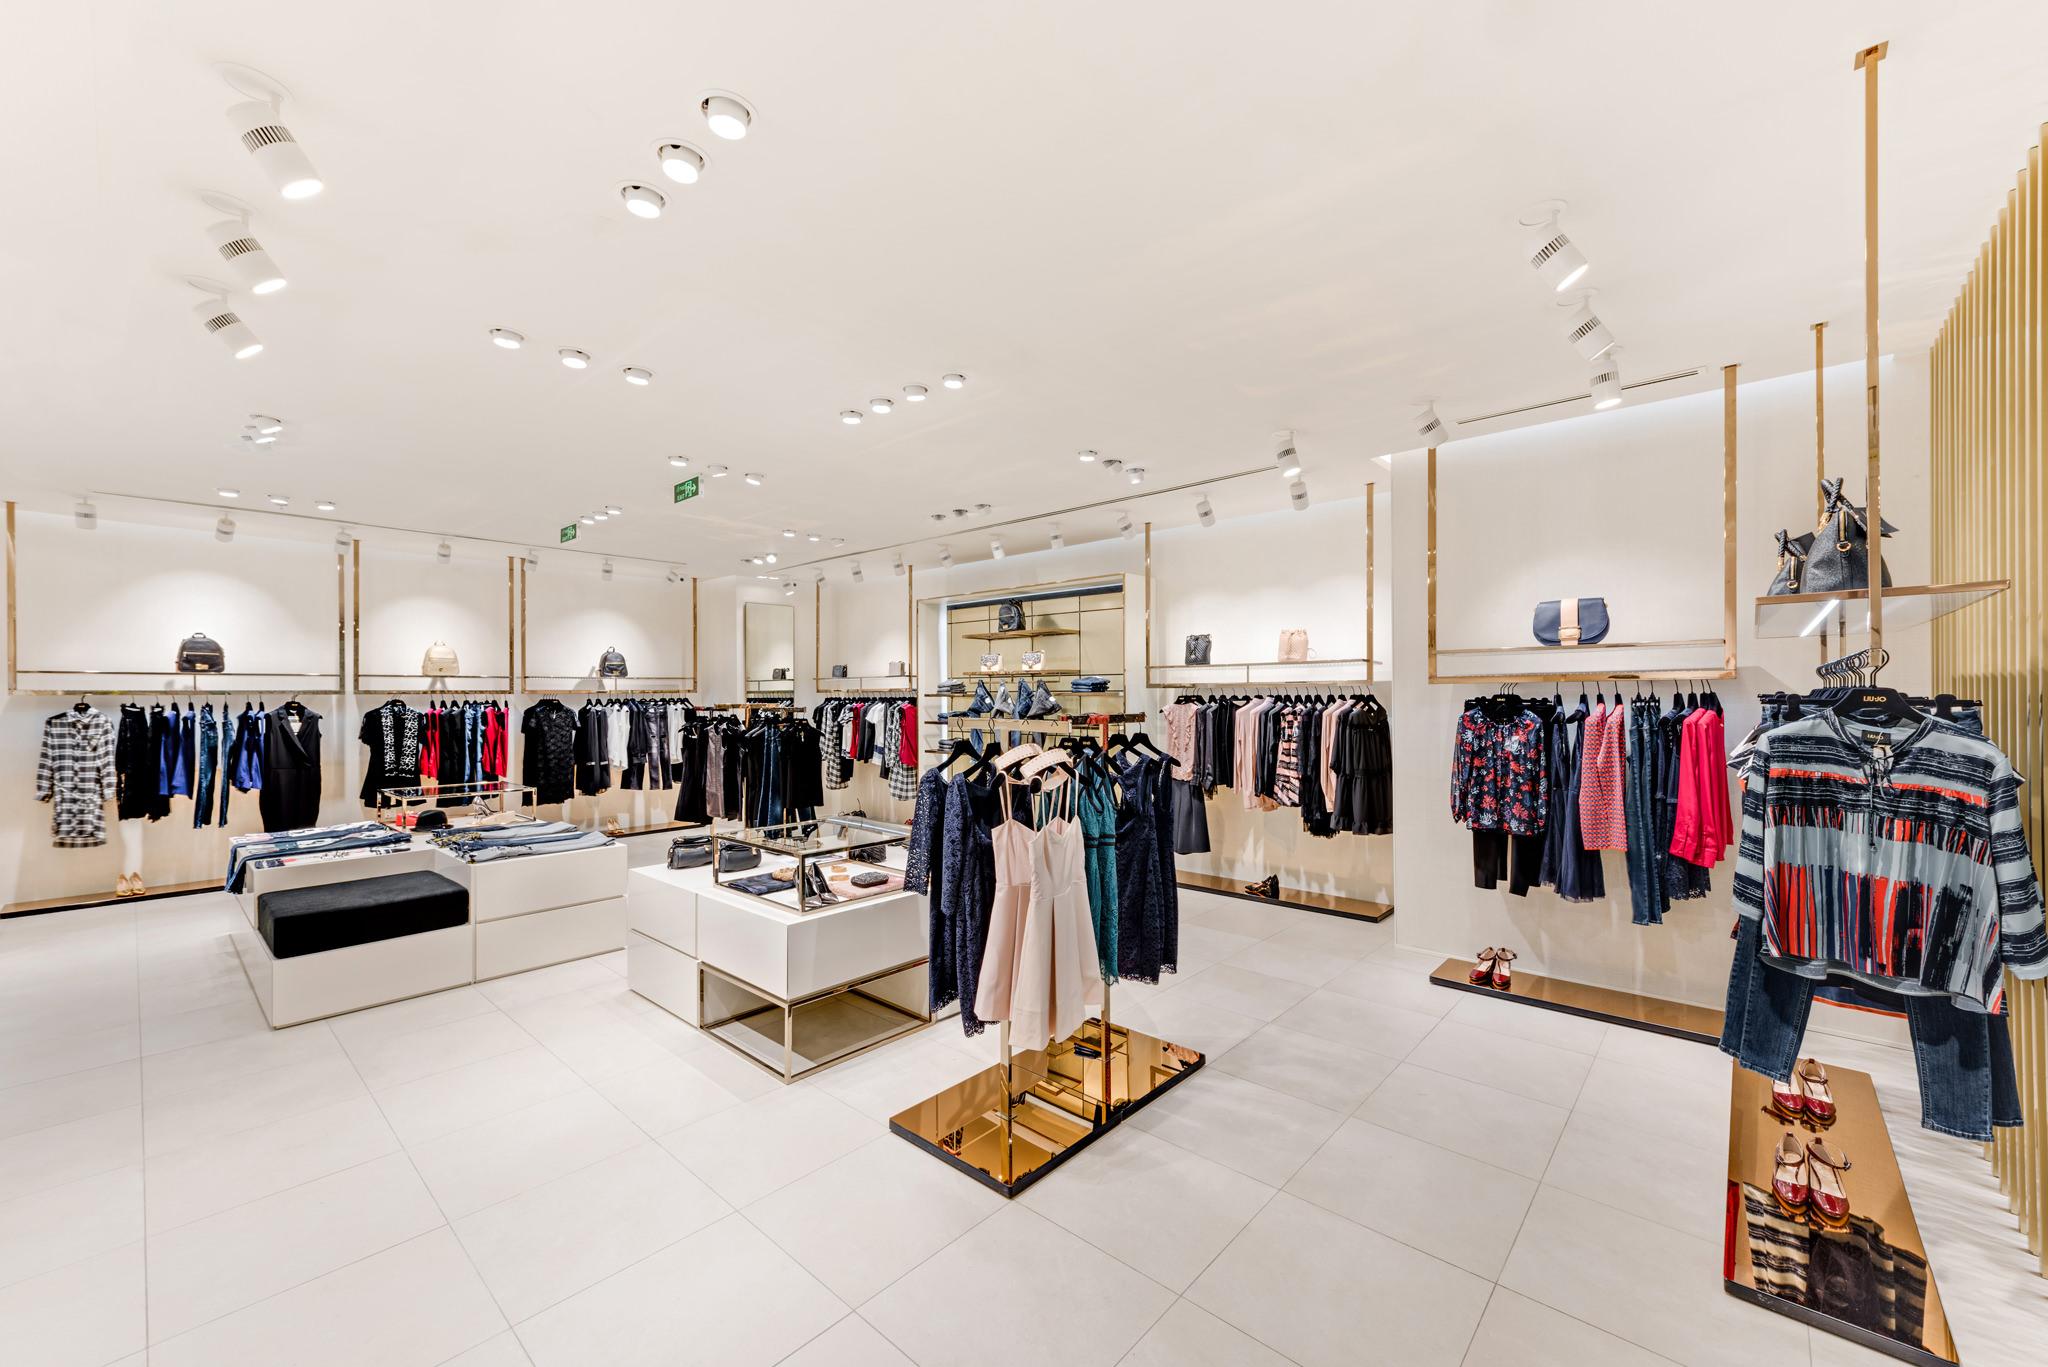 20160801 - Liu Jo - HCM - Commercial - Interior - Store - Retouch 0007.jpg